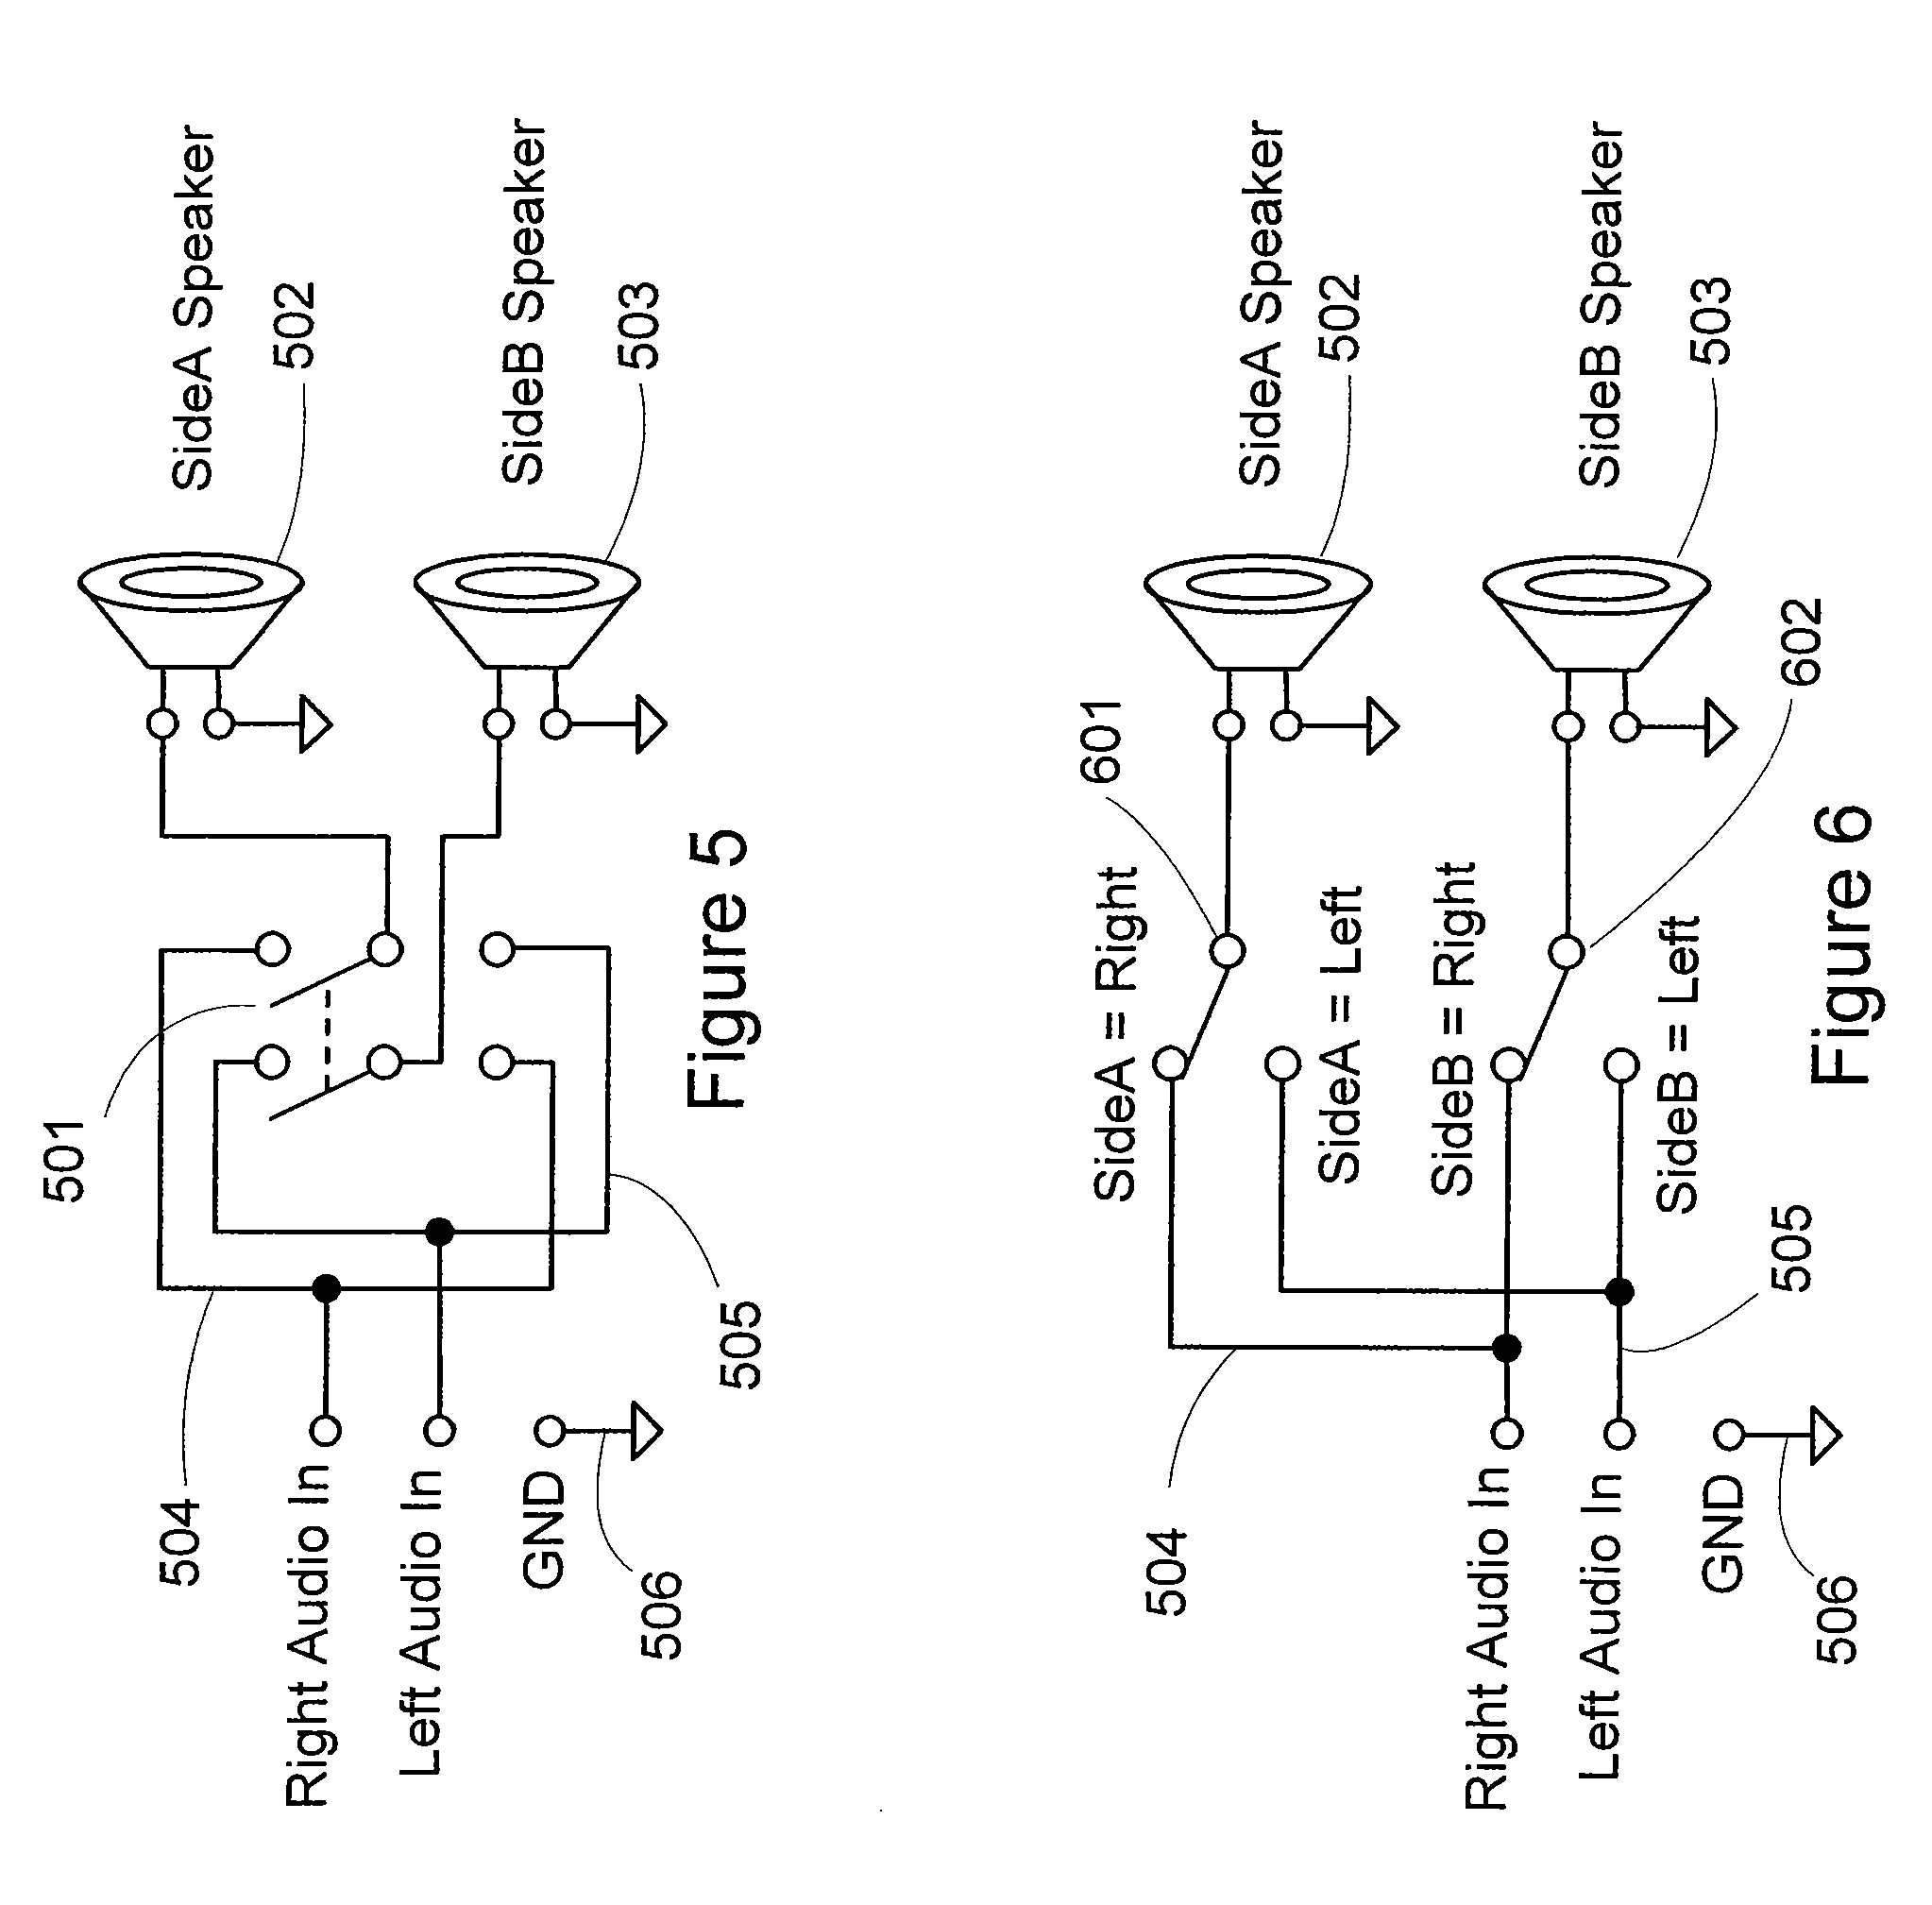 4 pole 3.5mm jack wiring diagram iphone